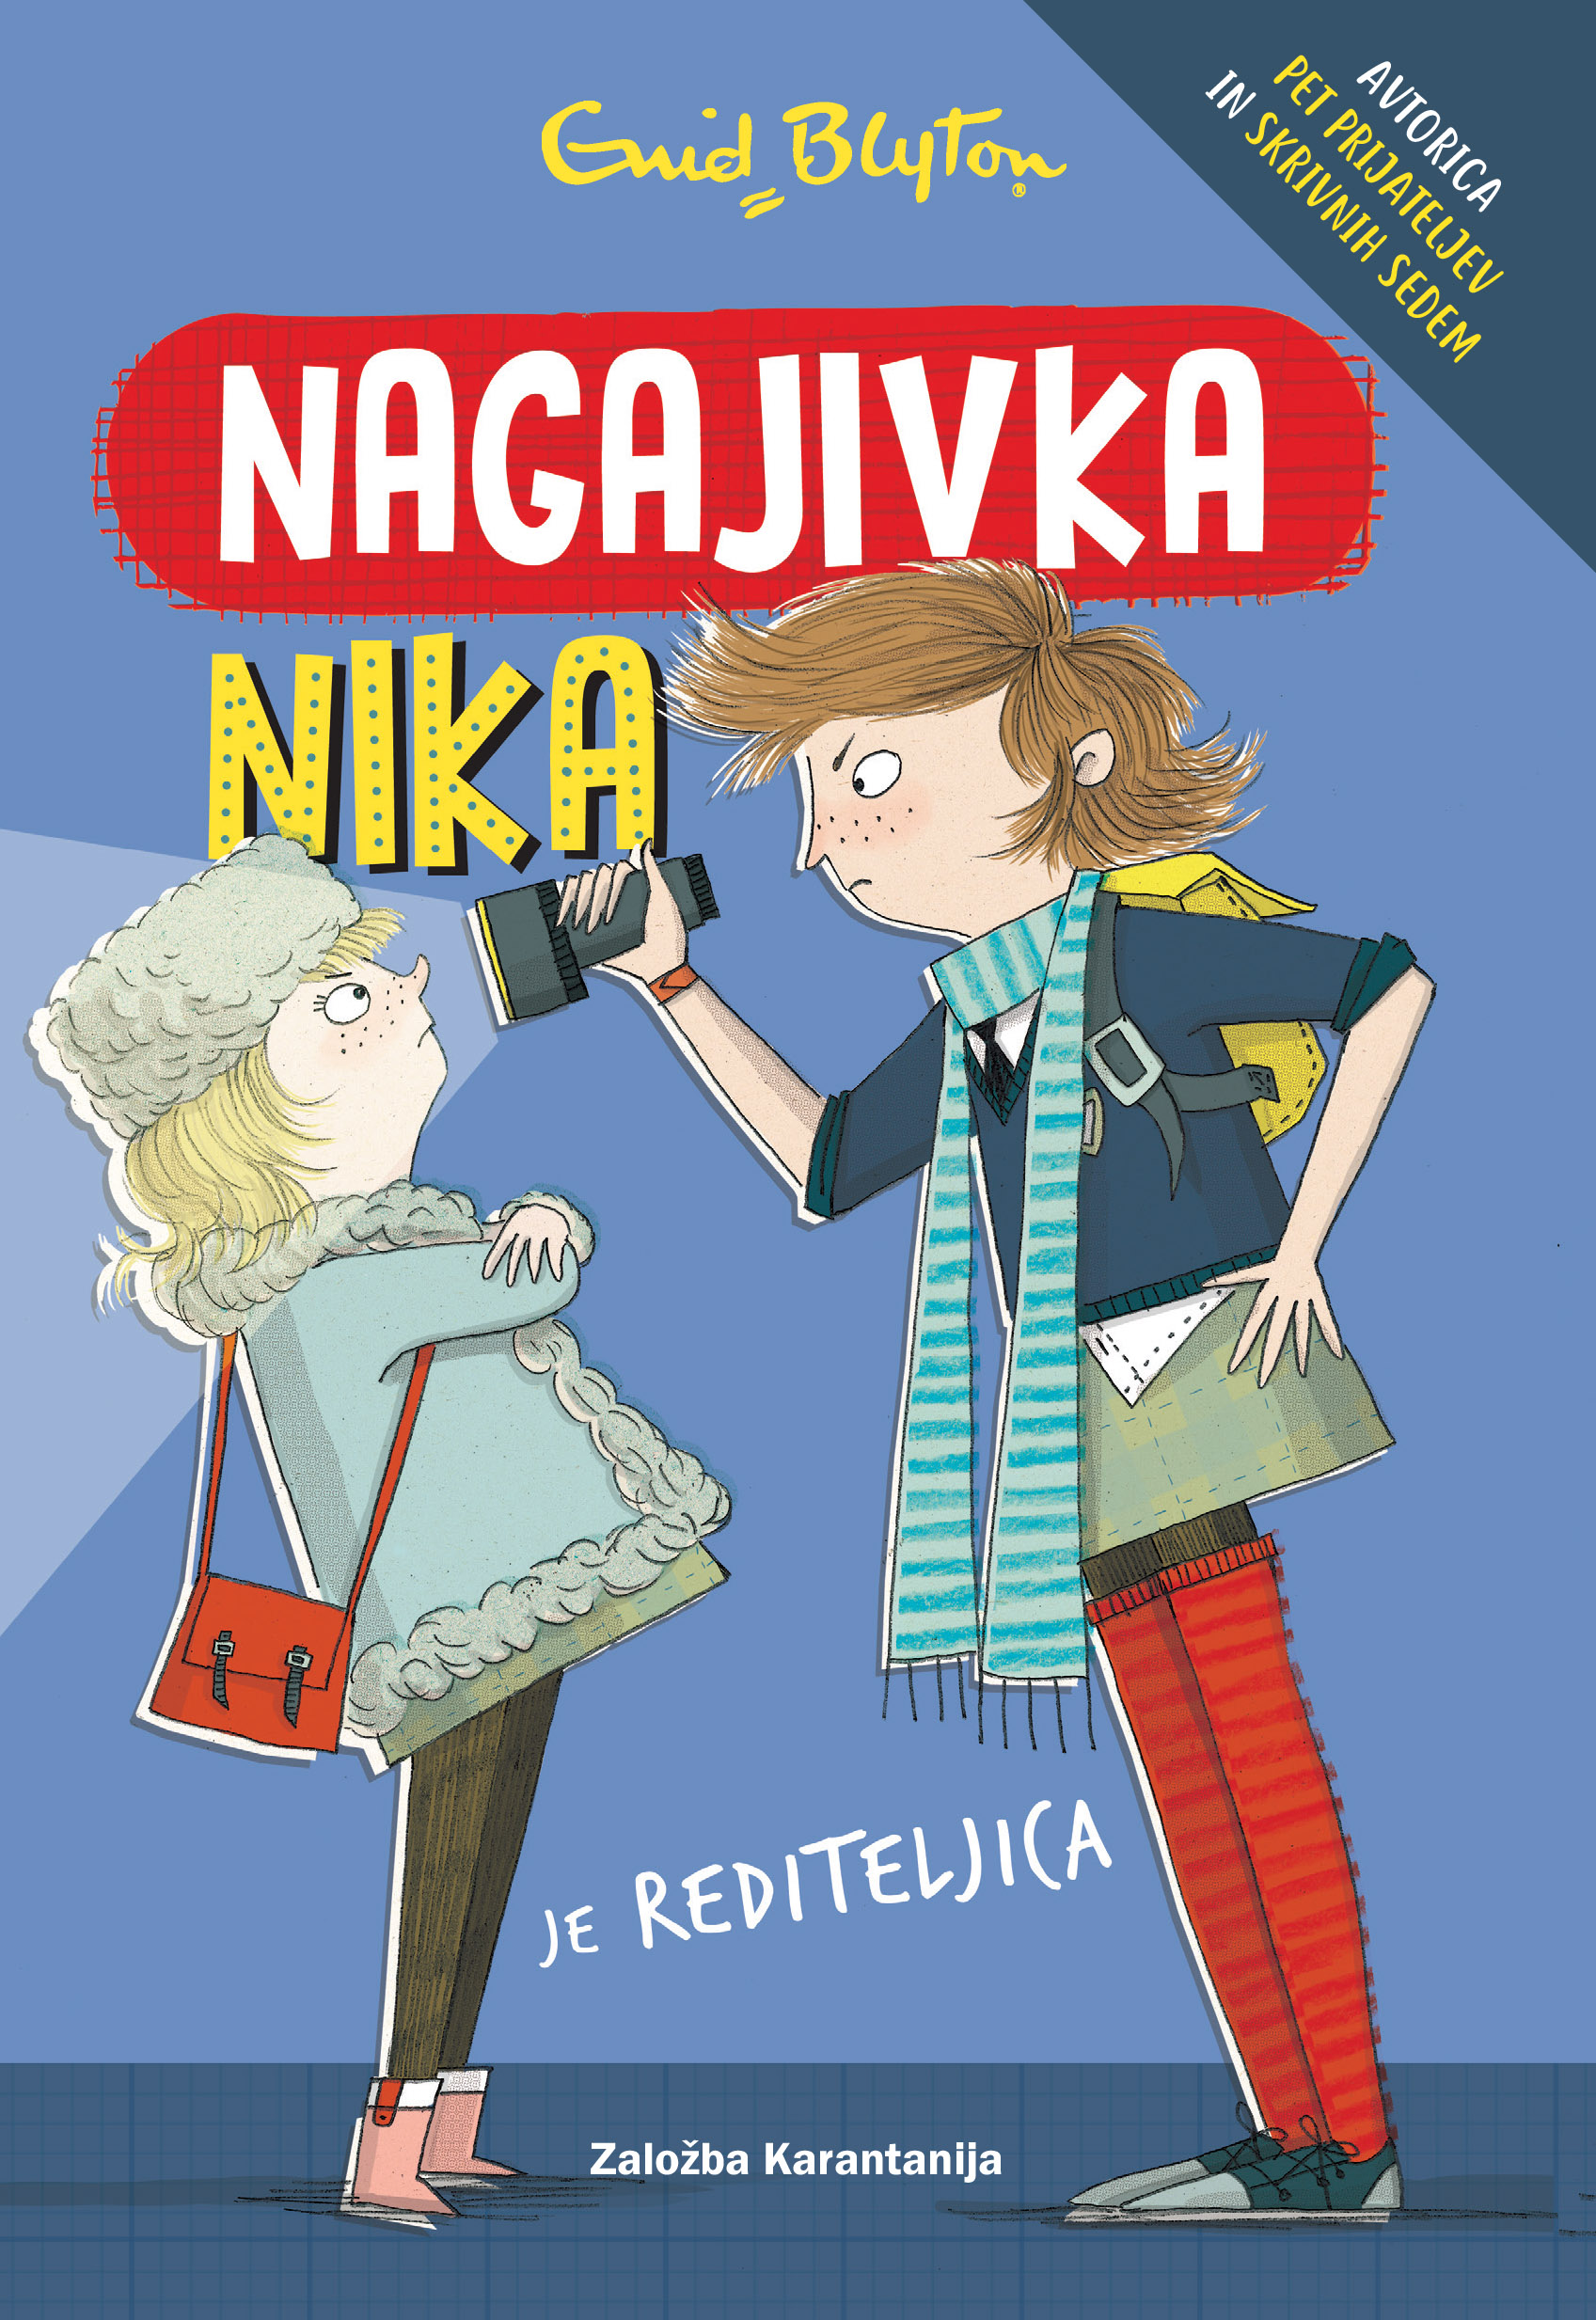 Nagajivka_Nika3_ovitek3